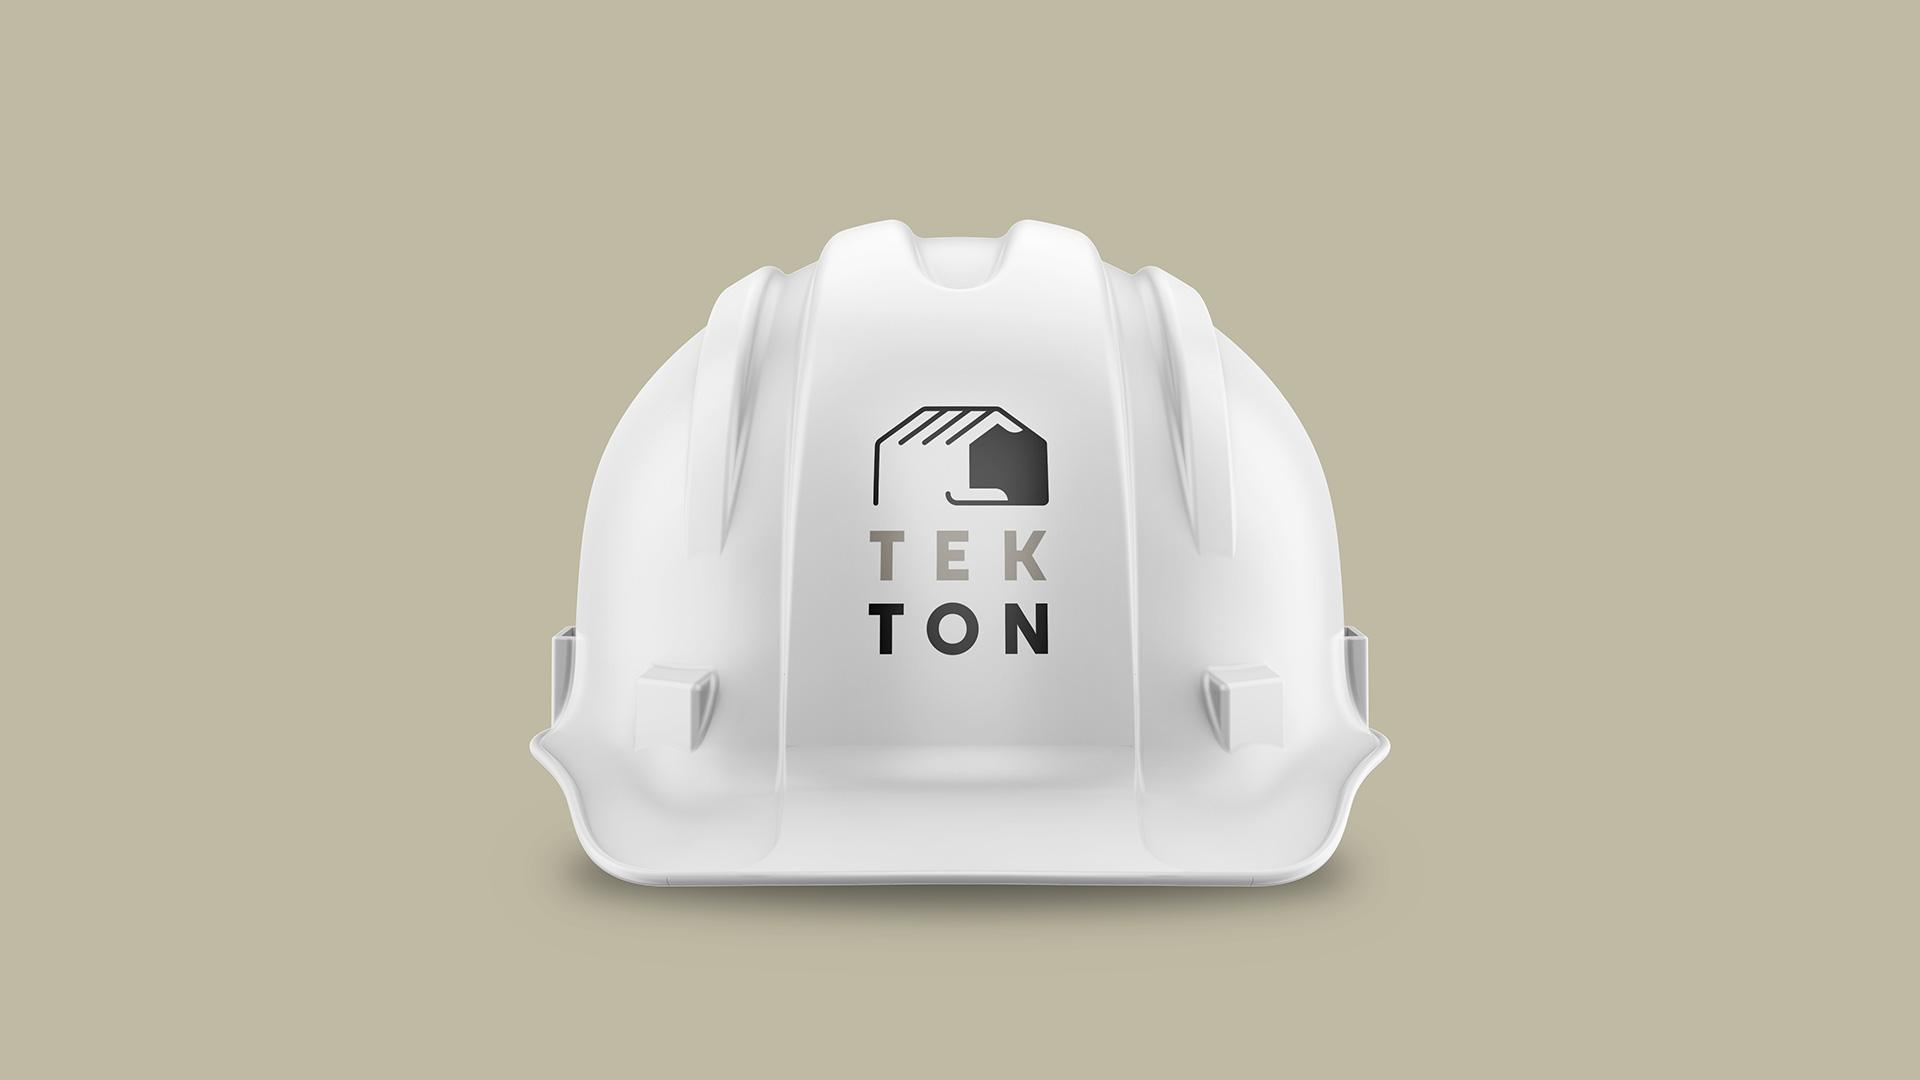 tekton-1-portfolio-fred-bueno-design